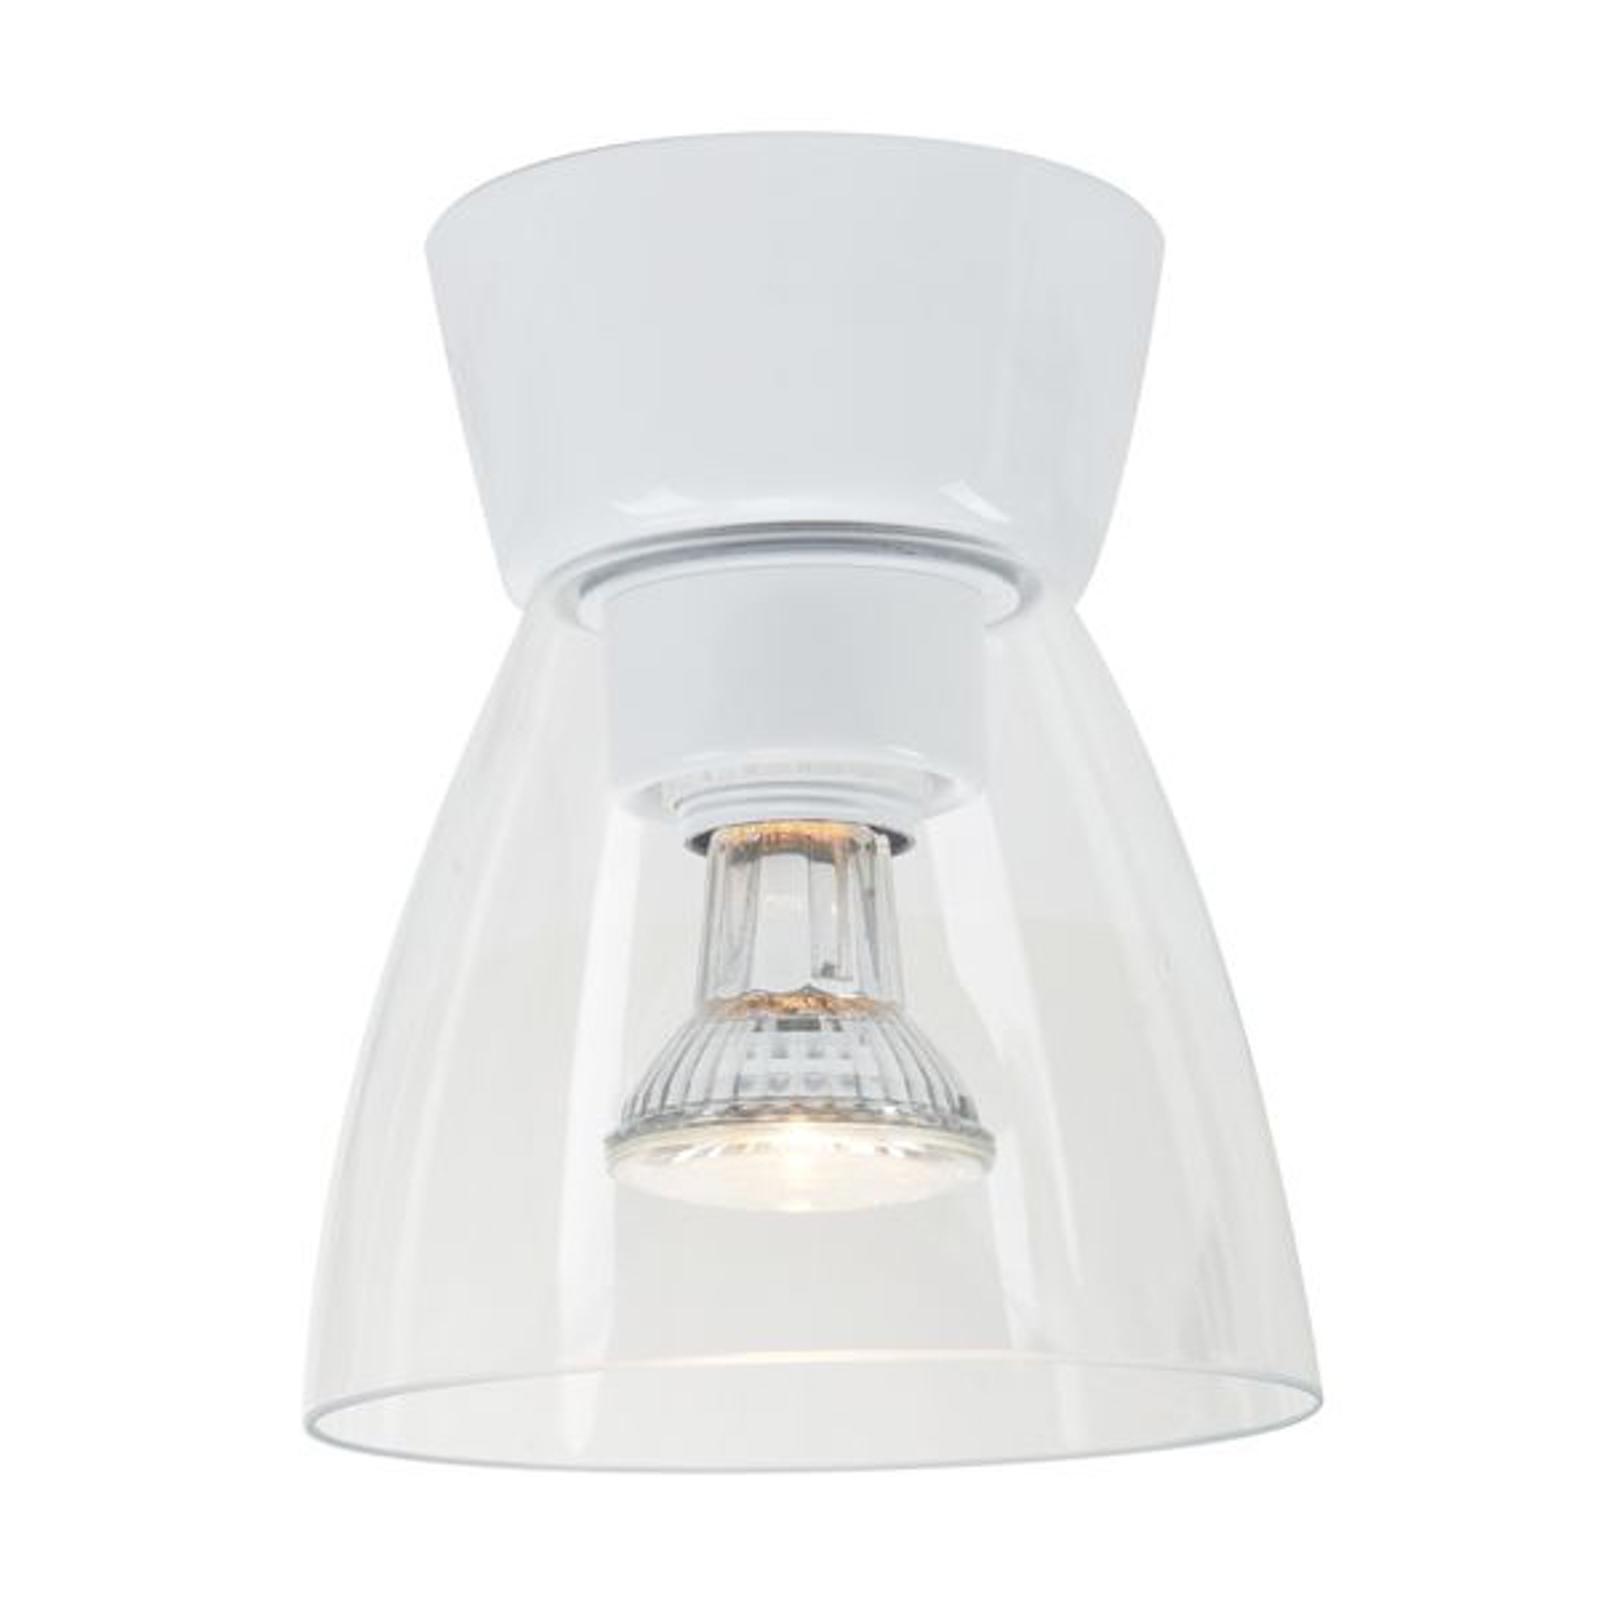 Lampa sufitowa Bizzo rozeta sufitowa biała